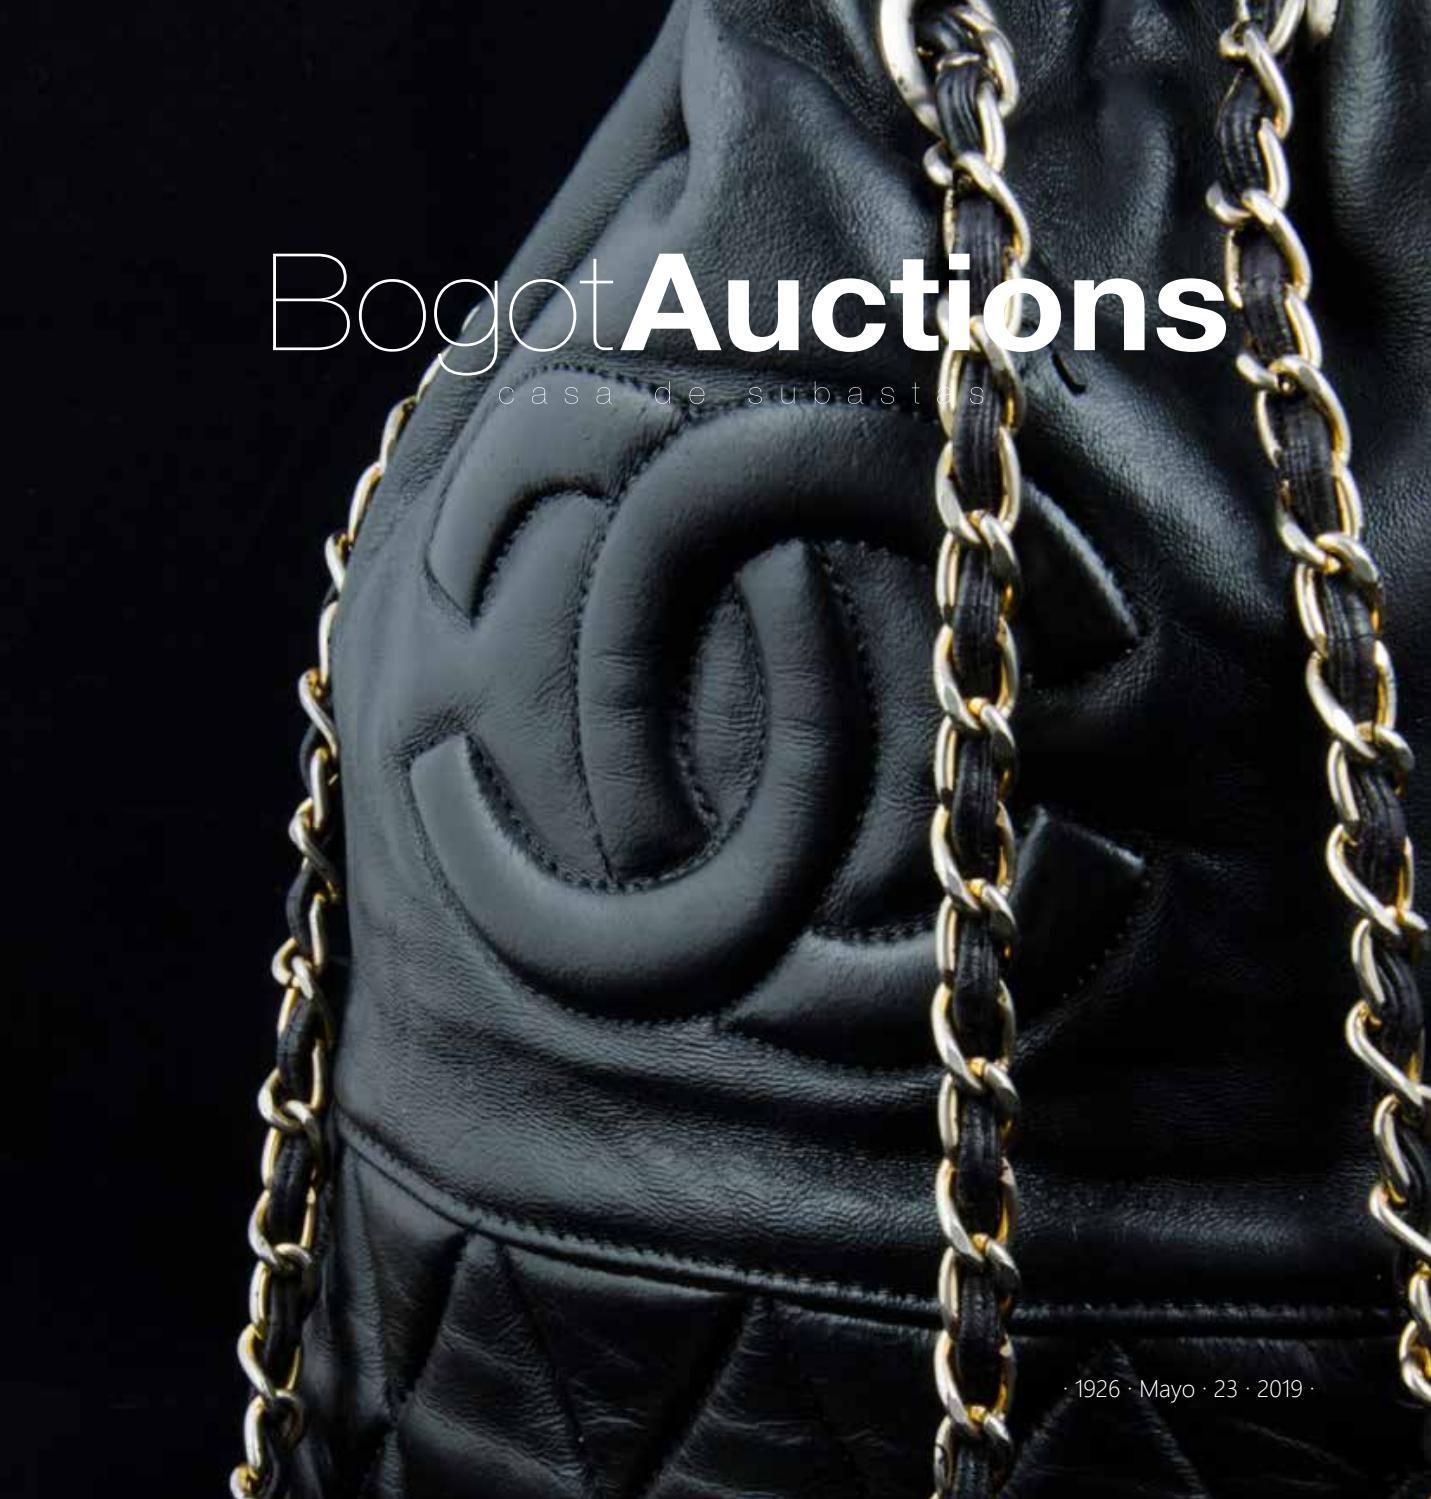 8d5ec86492be Bogota Auctions  Subasta de Moda y Vintage. catálogo 1924